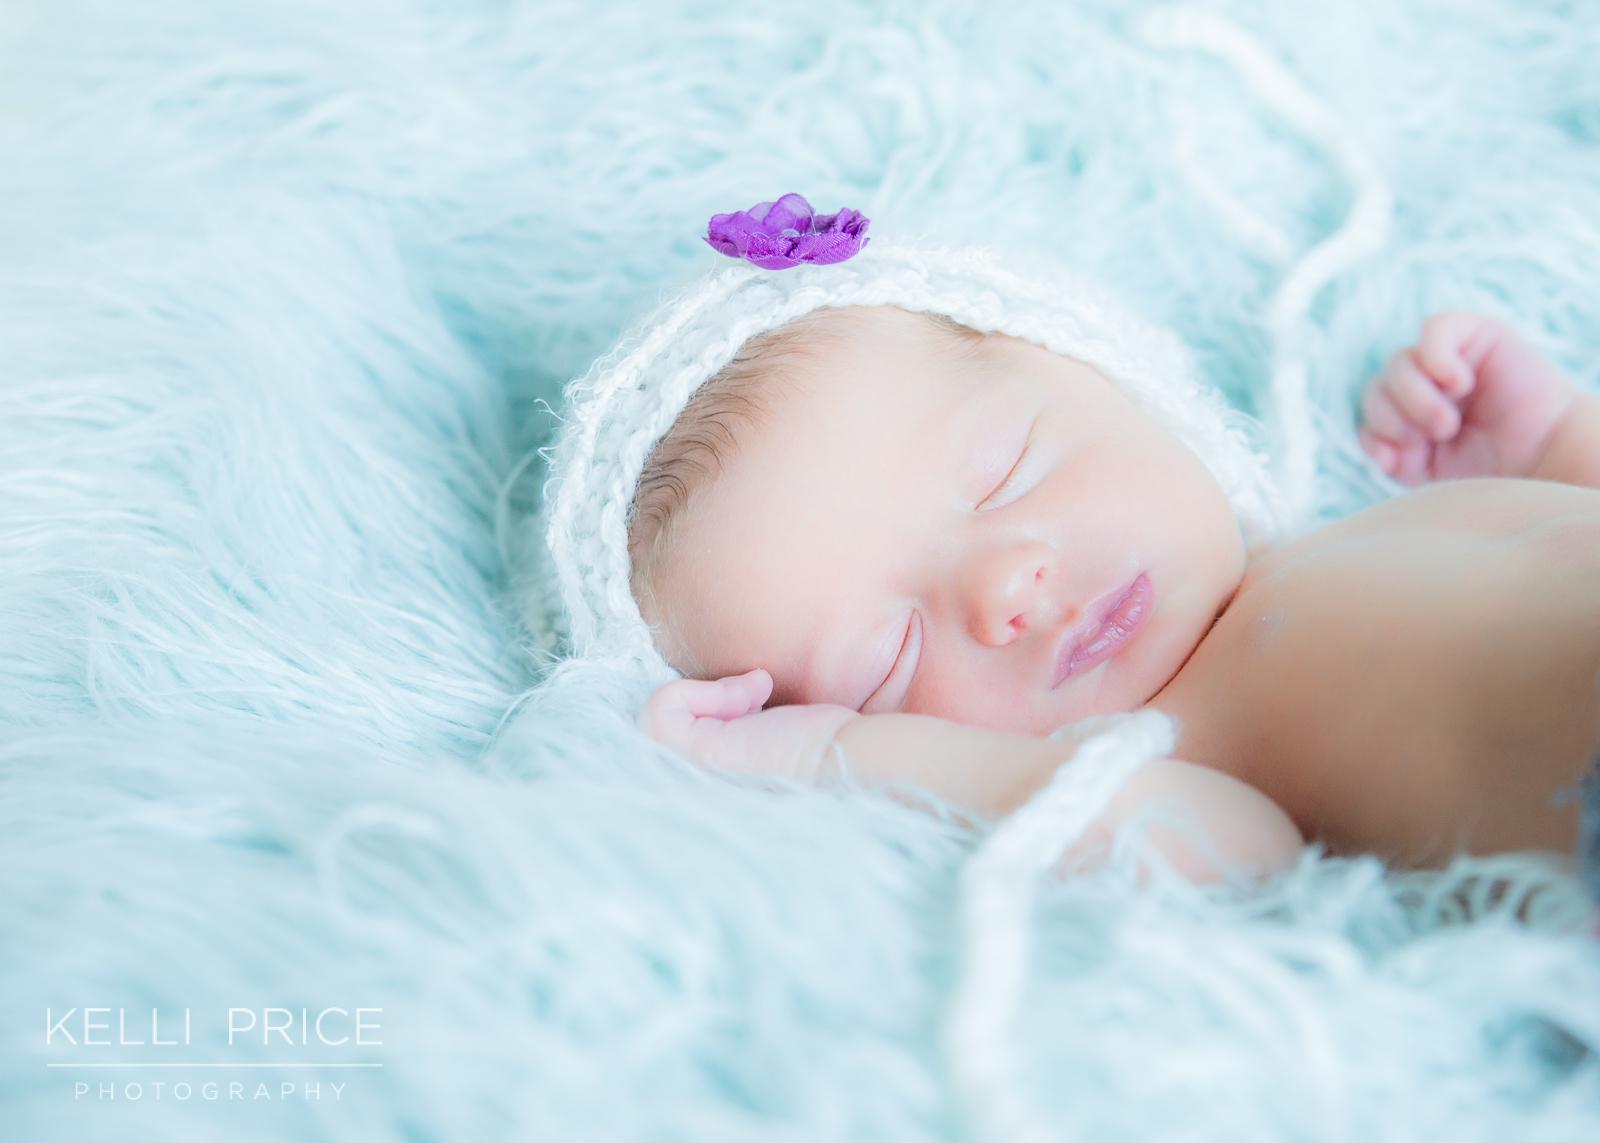 OliviaHoban3KelliPricePhotographyAugust2015.jpg